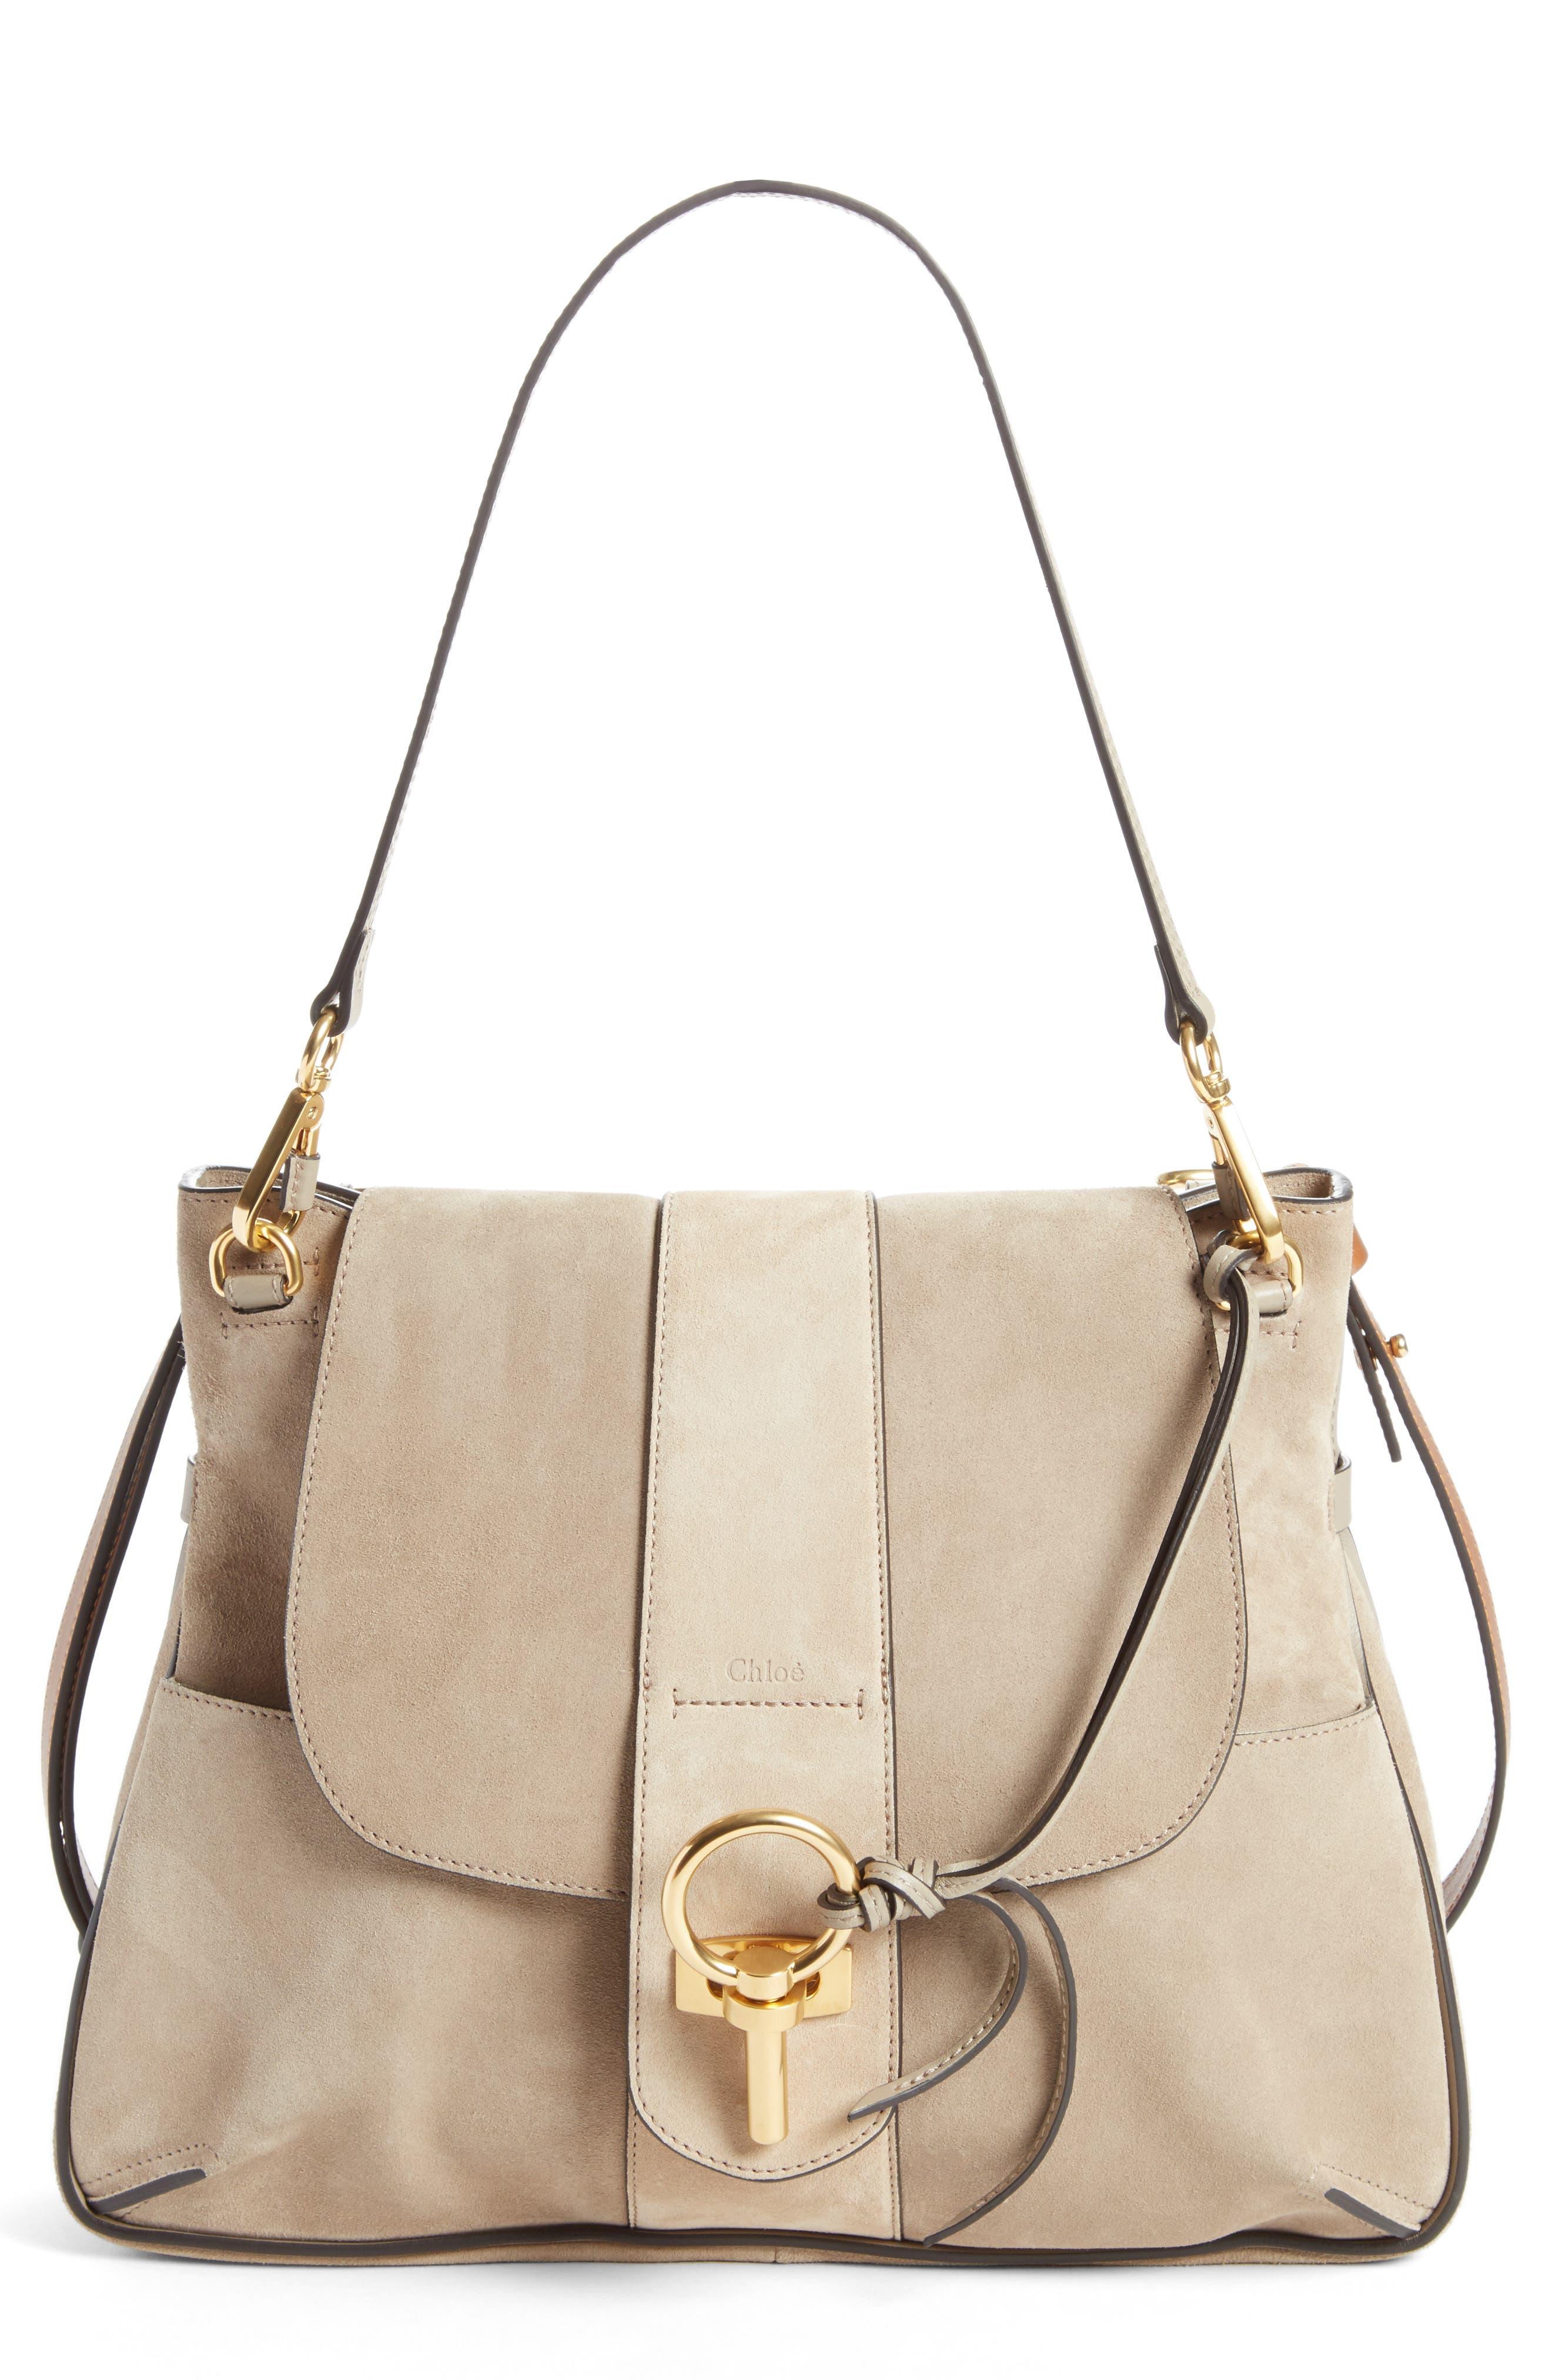 Medium Lexa Leather Shoulder Bag,                             Main thumbnail 1, color,                             031